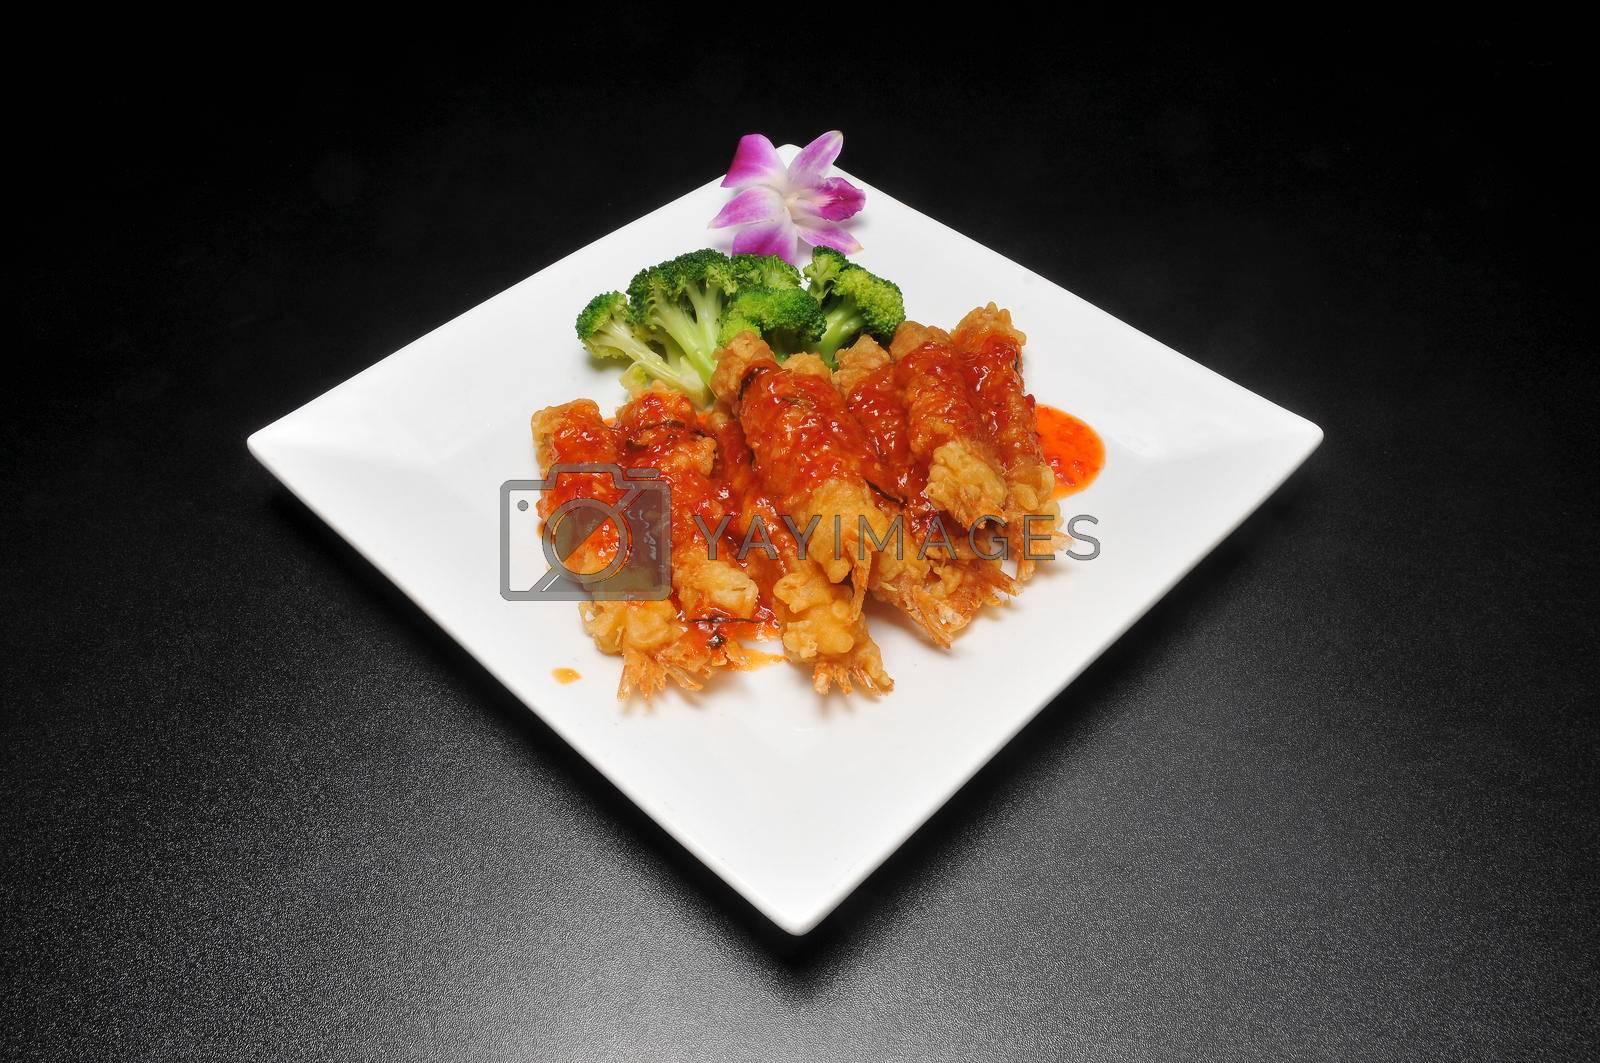 Delicious Thai food known as Bangkok shrimp